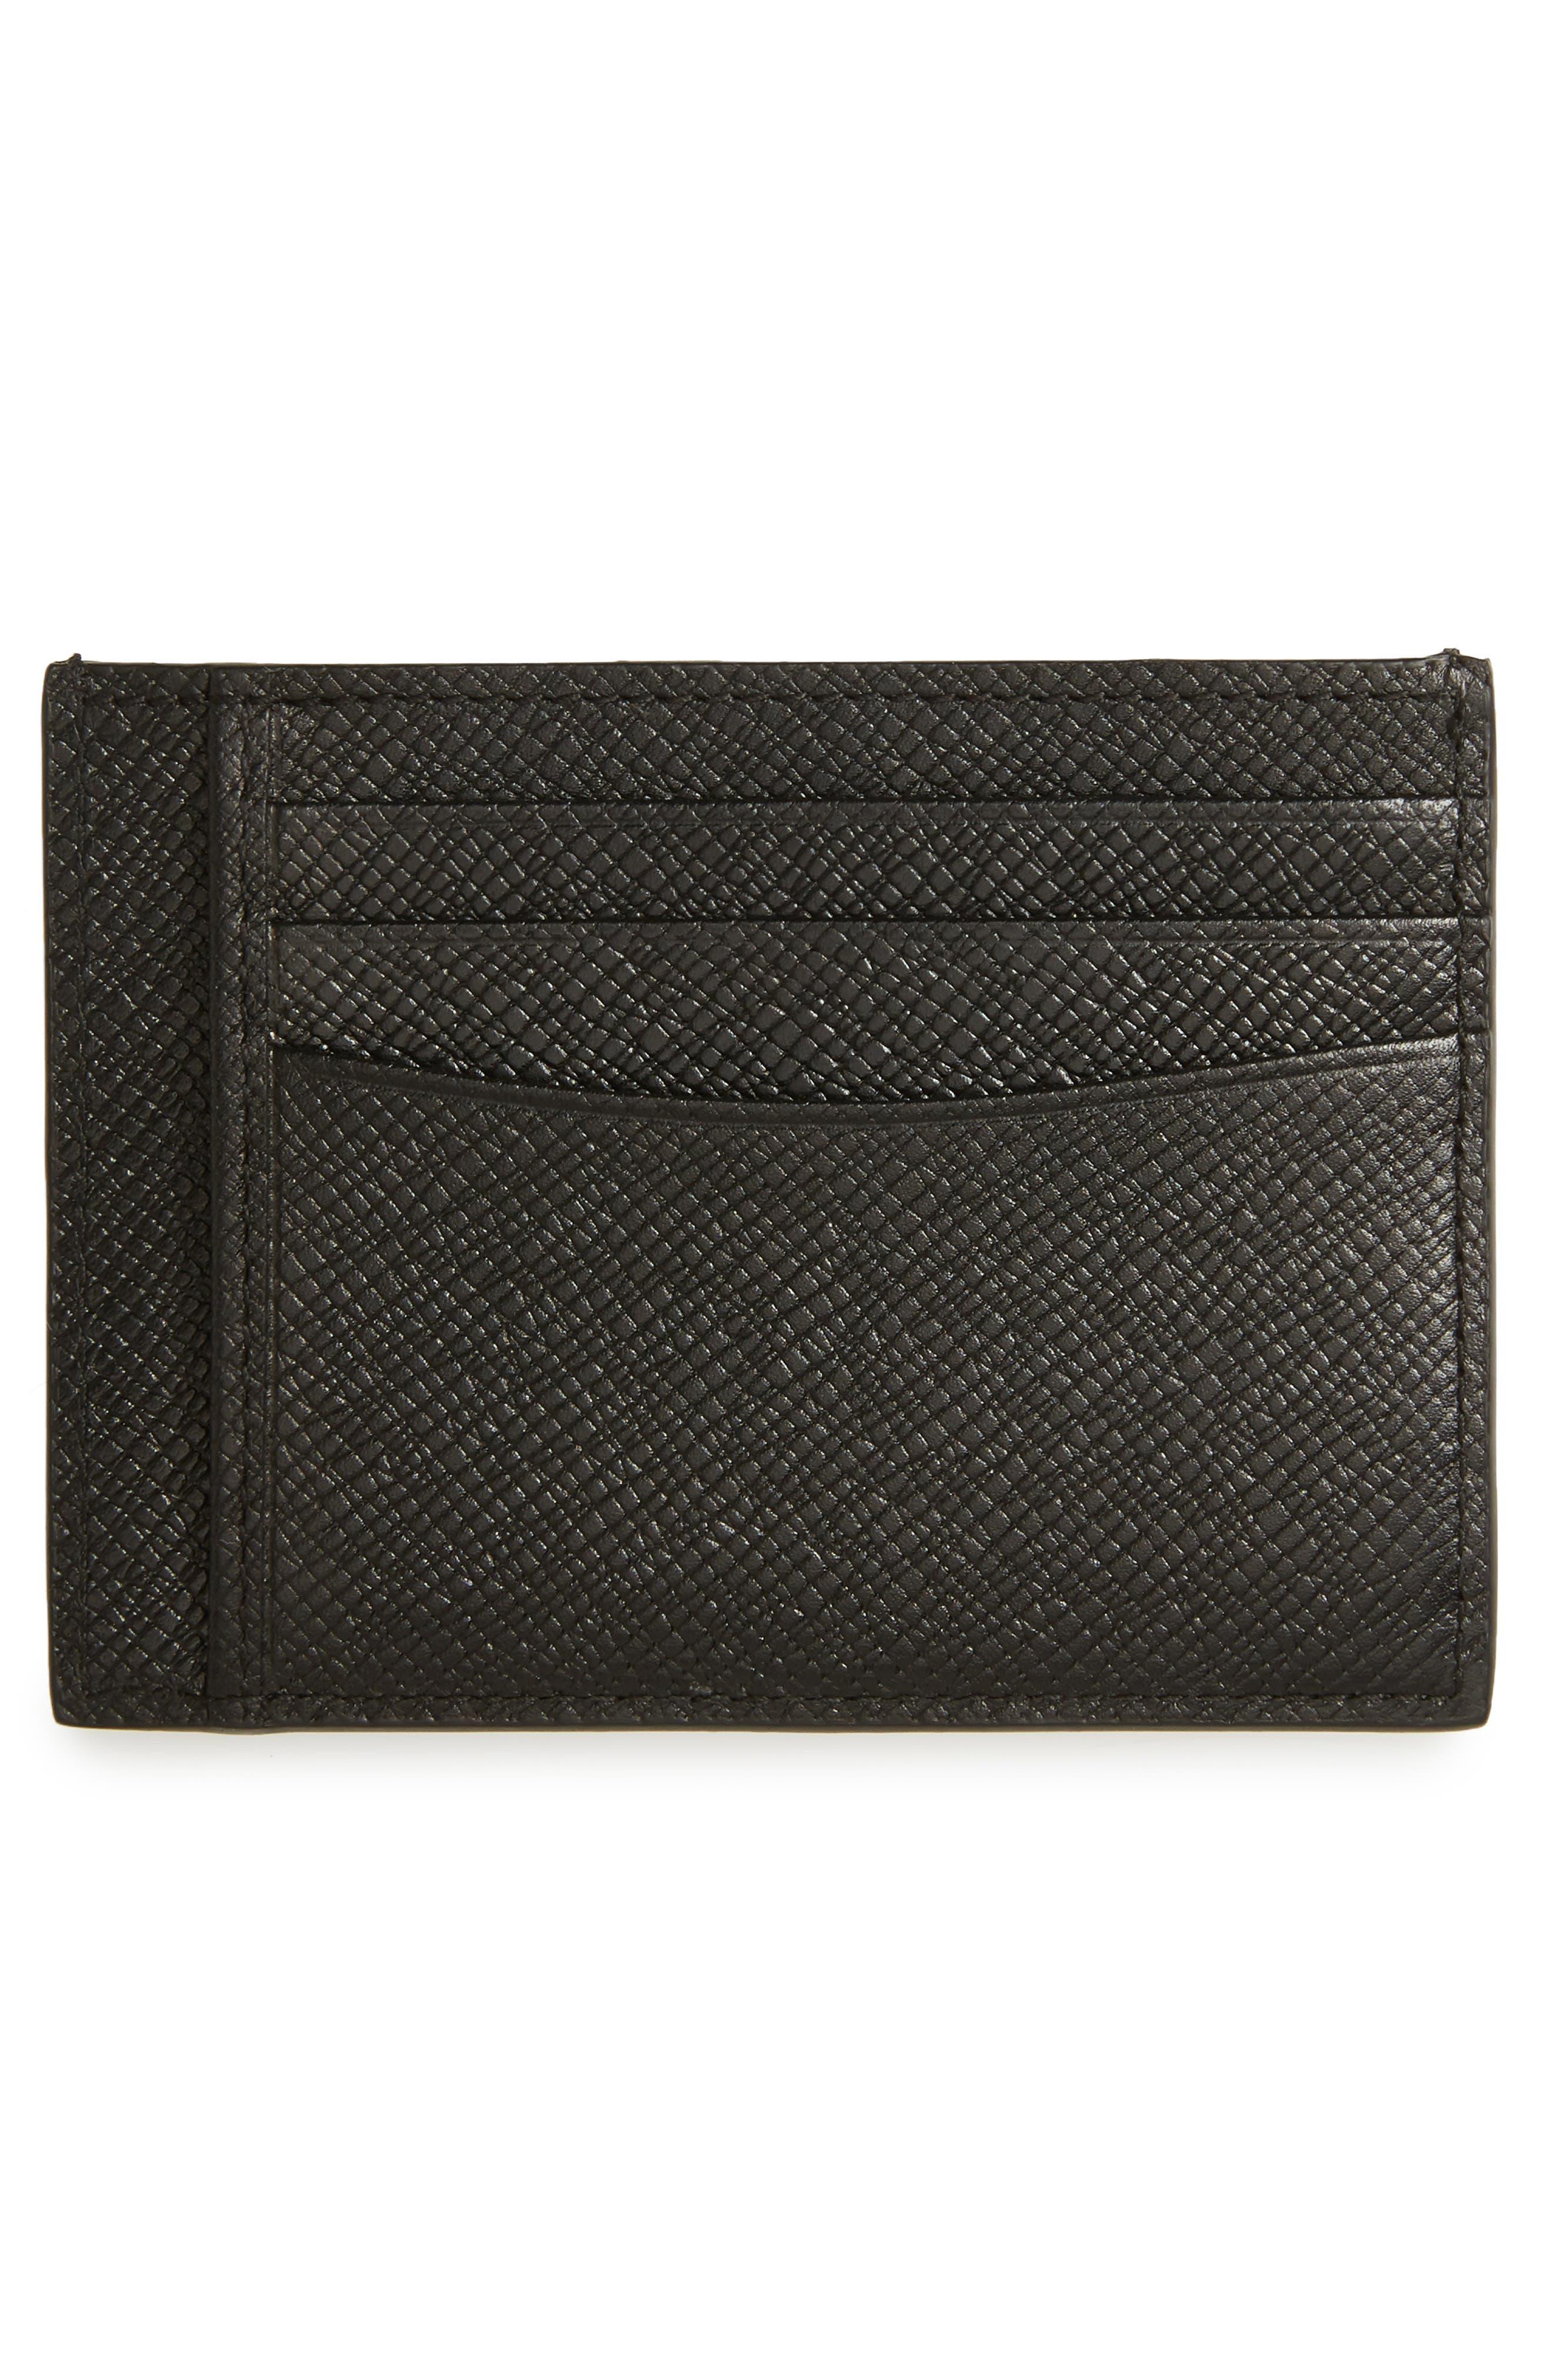 Signature Leather Card Case,                             Alternate thumbnail 2, color,                             016